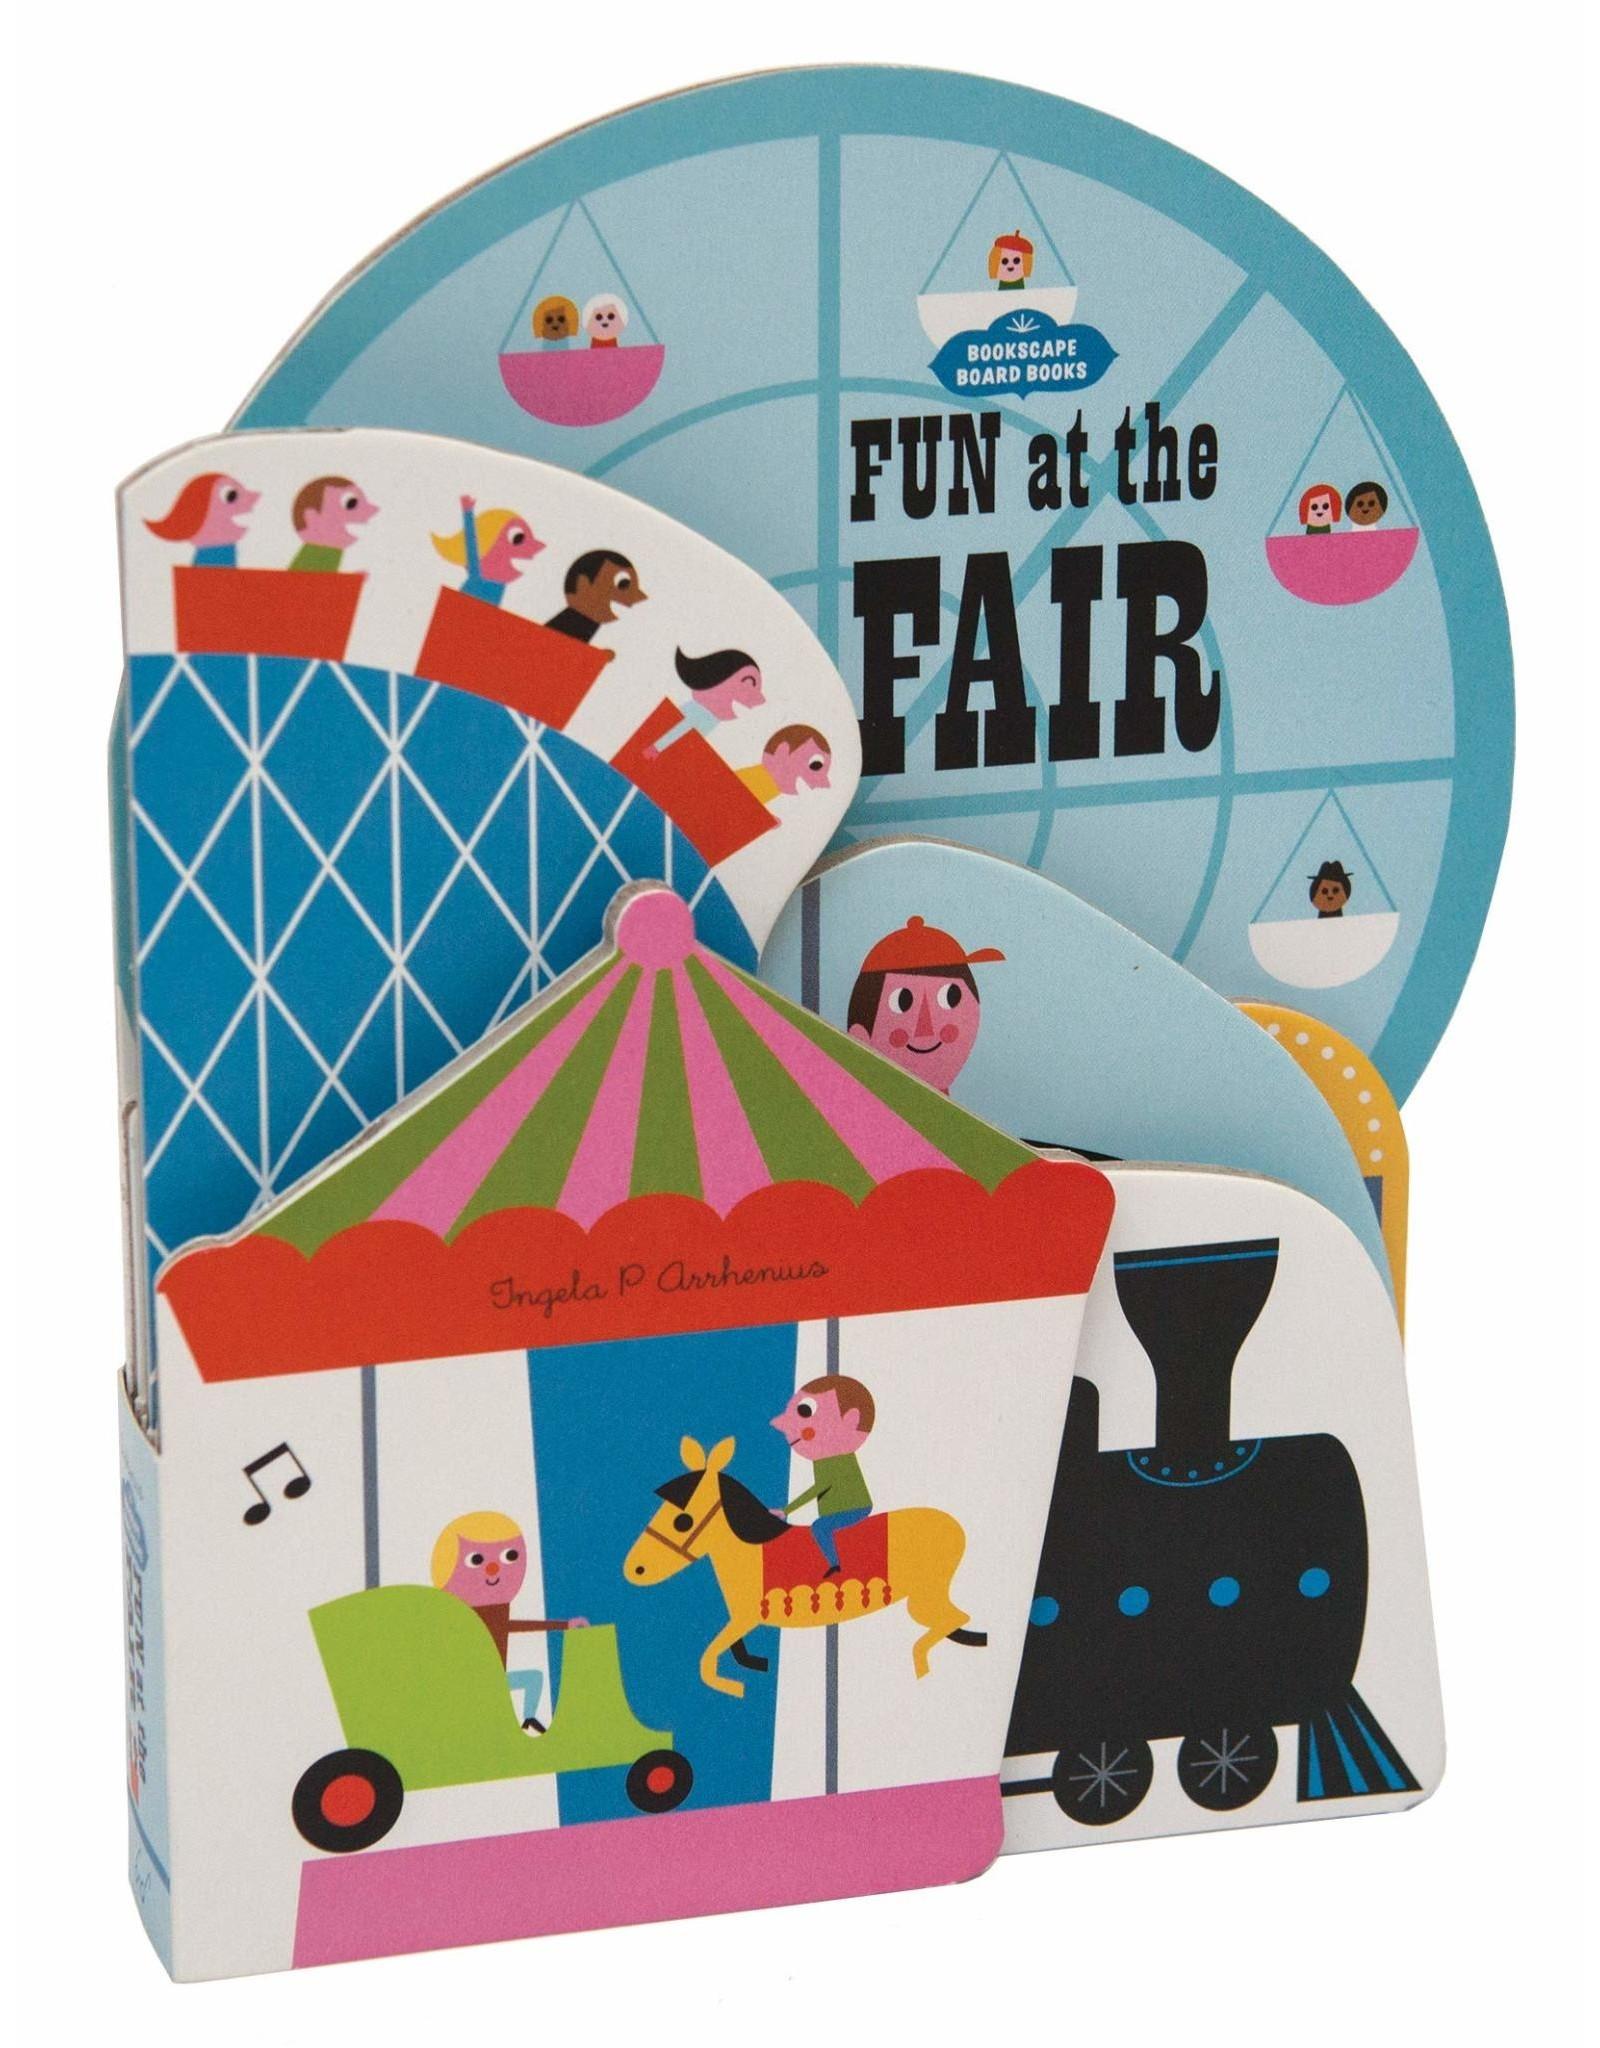 Chronicle Books Bookscape Board Books: Fun at the Fair